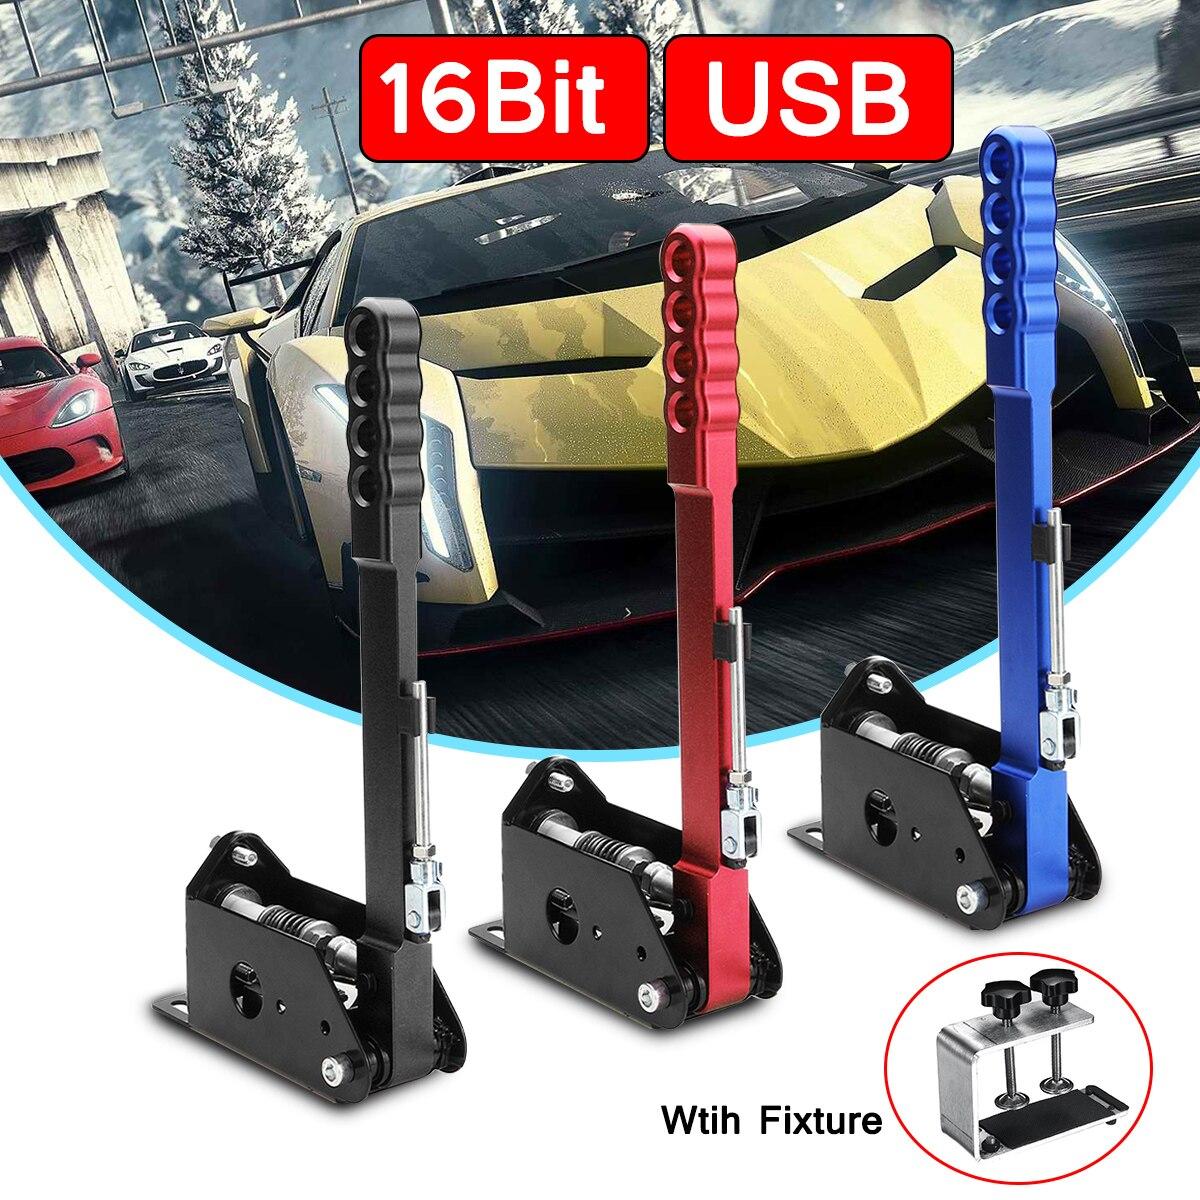 Adjustable Height Clamp 16bit Hall Sensor USB Handbrake Clamp PC Windows For Sim Racing Game For G25 G27 G29 T500 T300